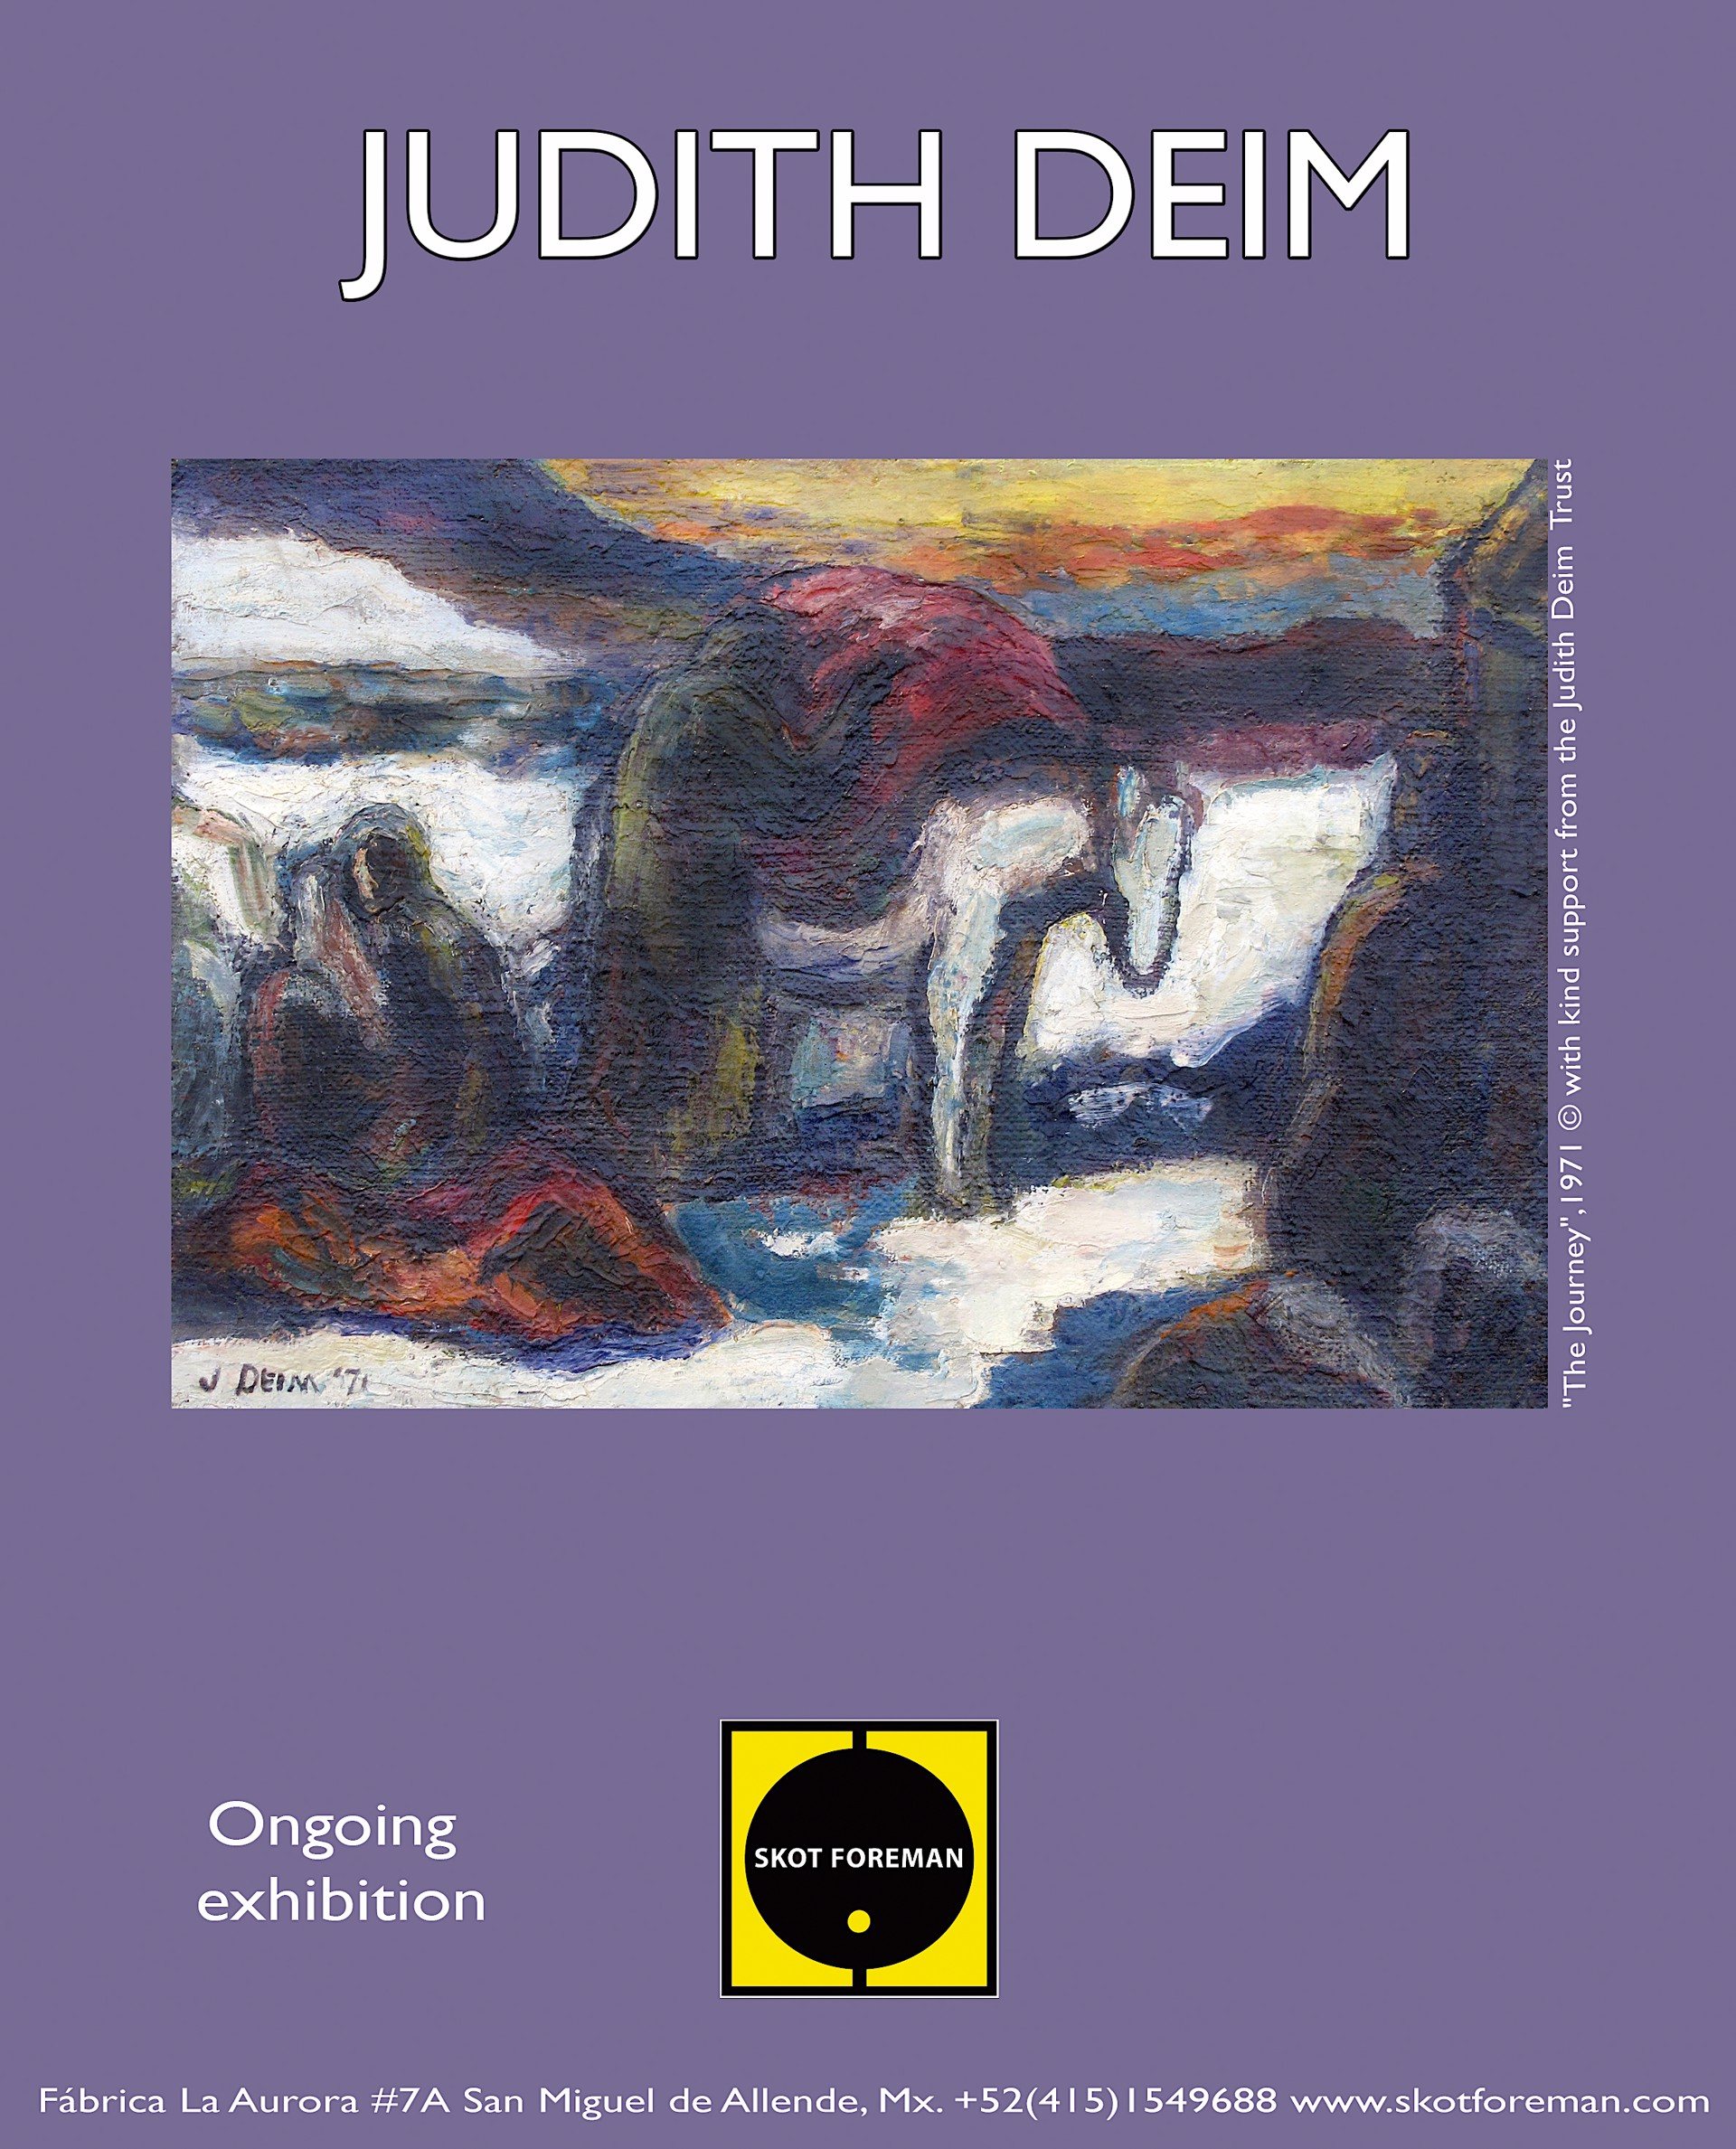 The Journey by Judith Deim